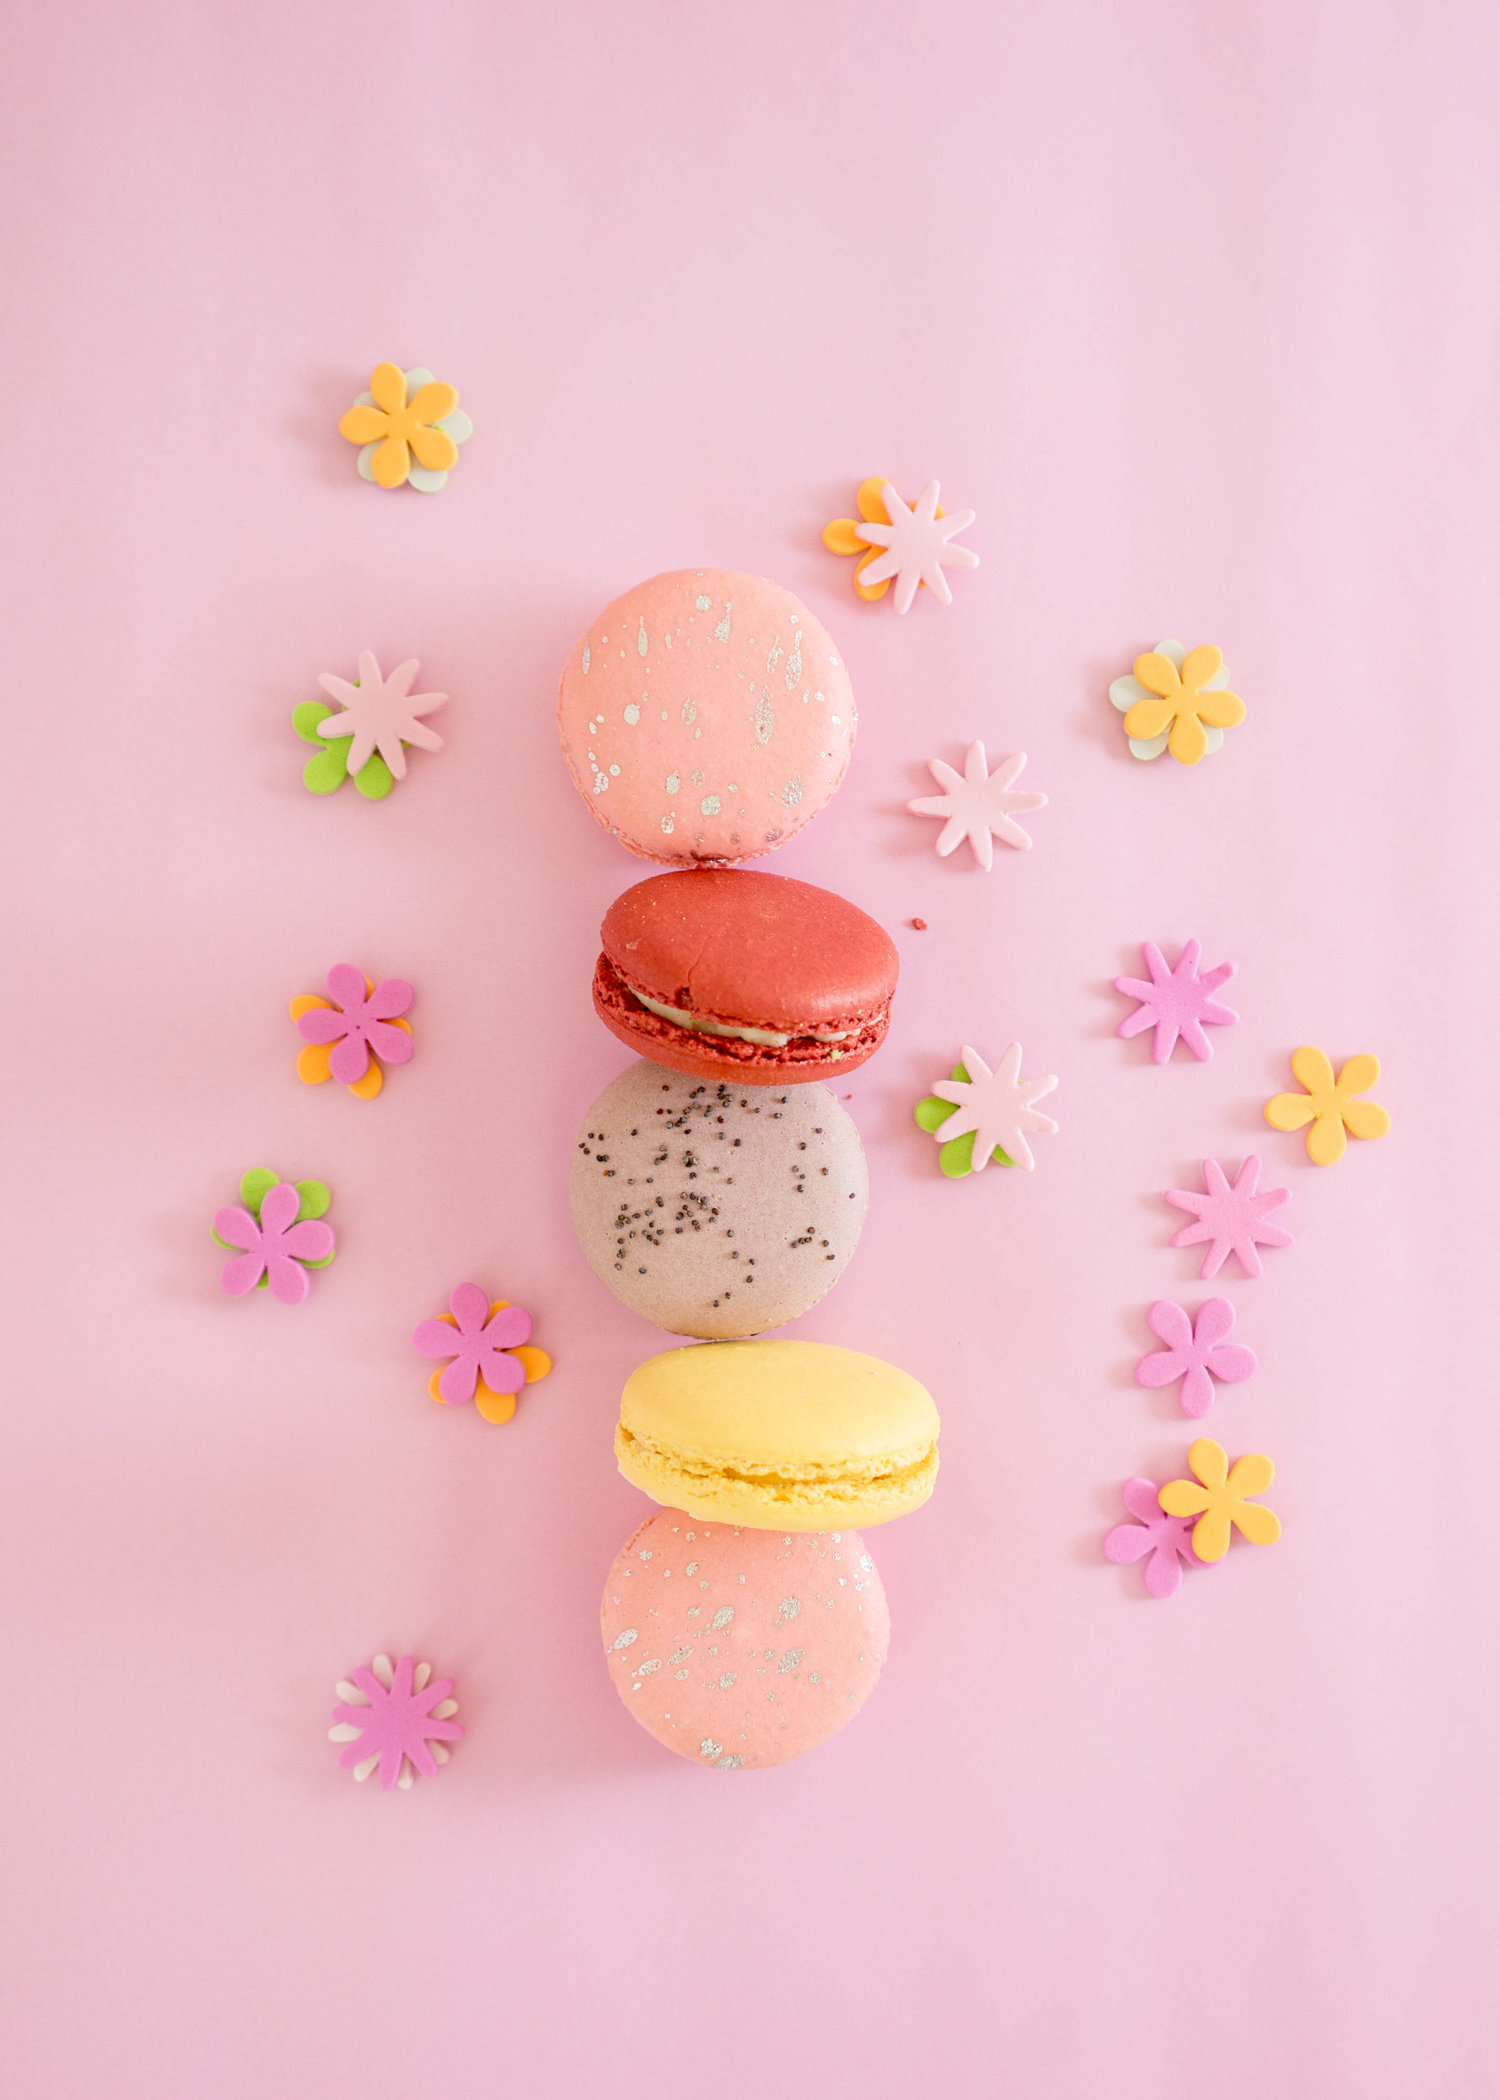 assorted-macarons-photo-chantal-guillon-palo-alto-store-afewgoodclicks-net